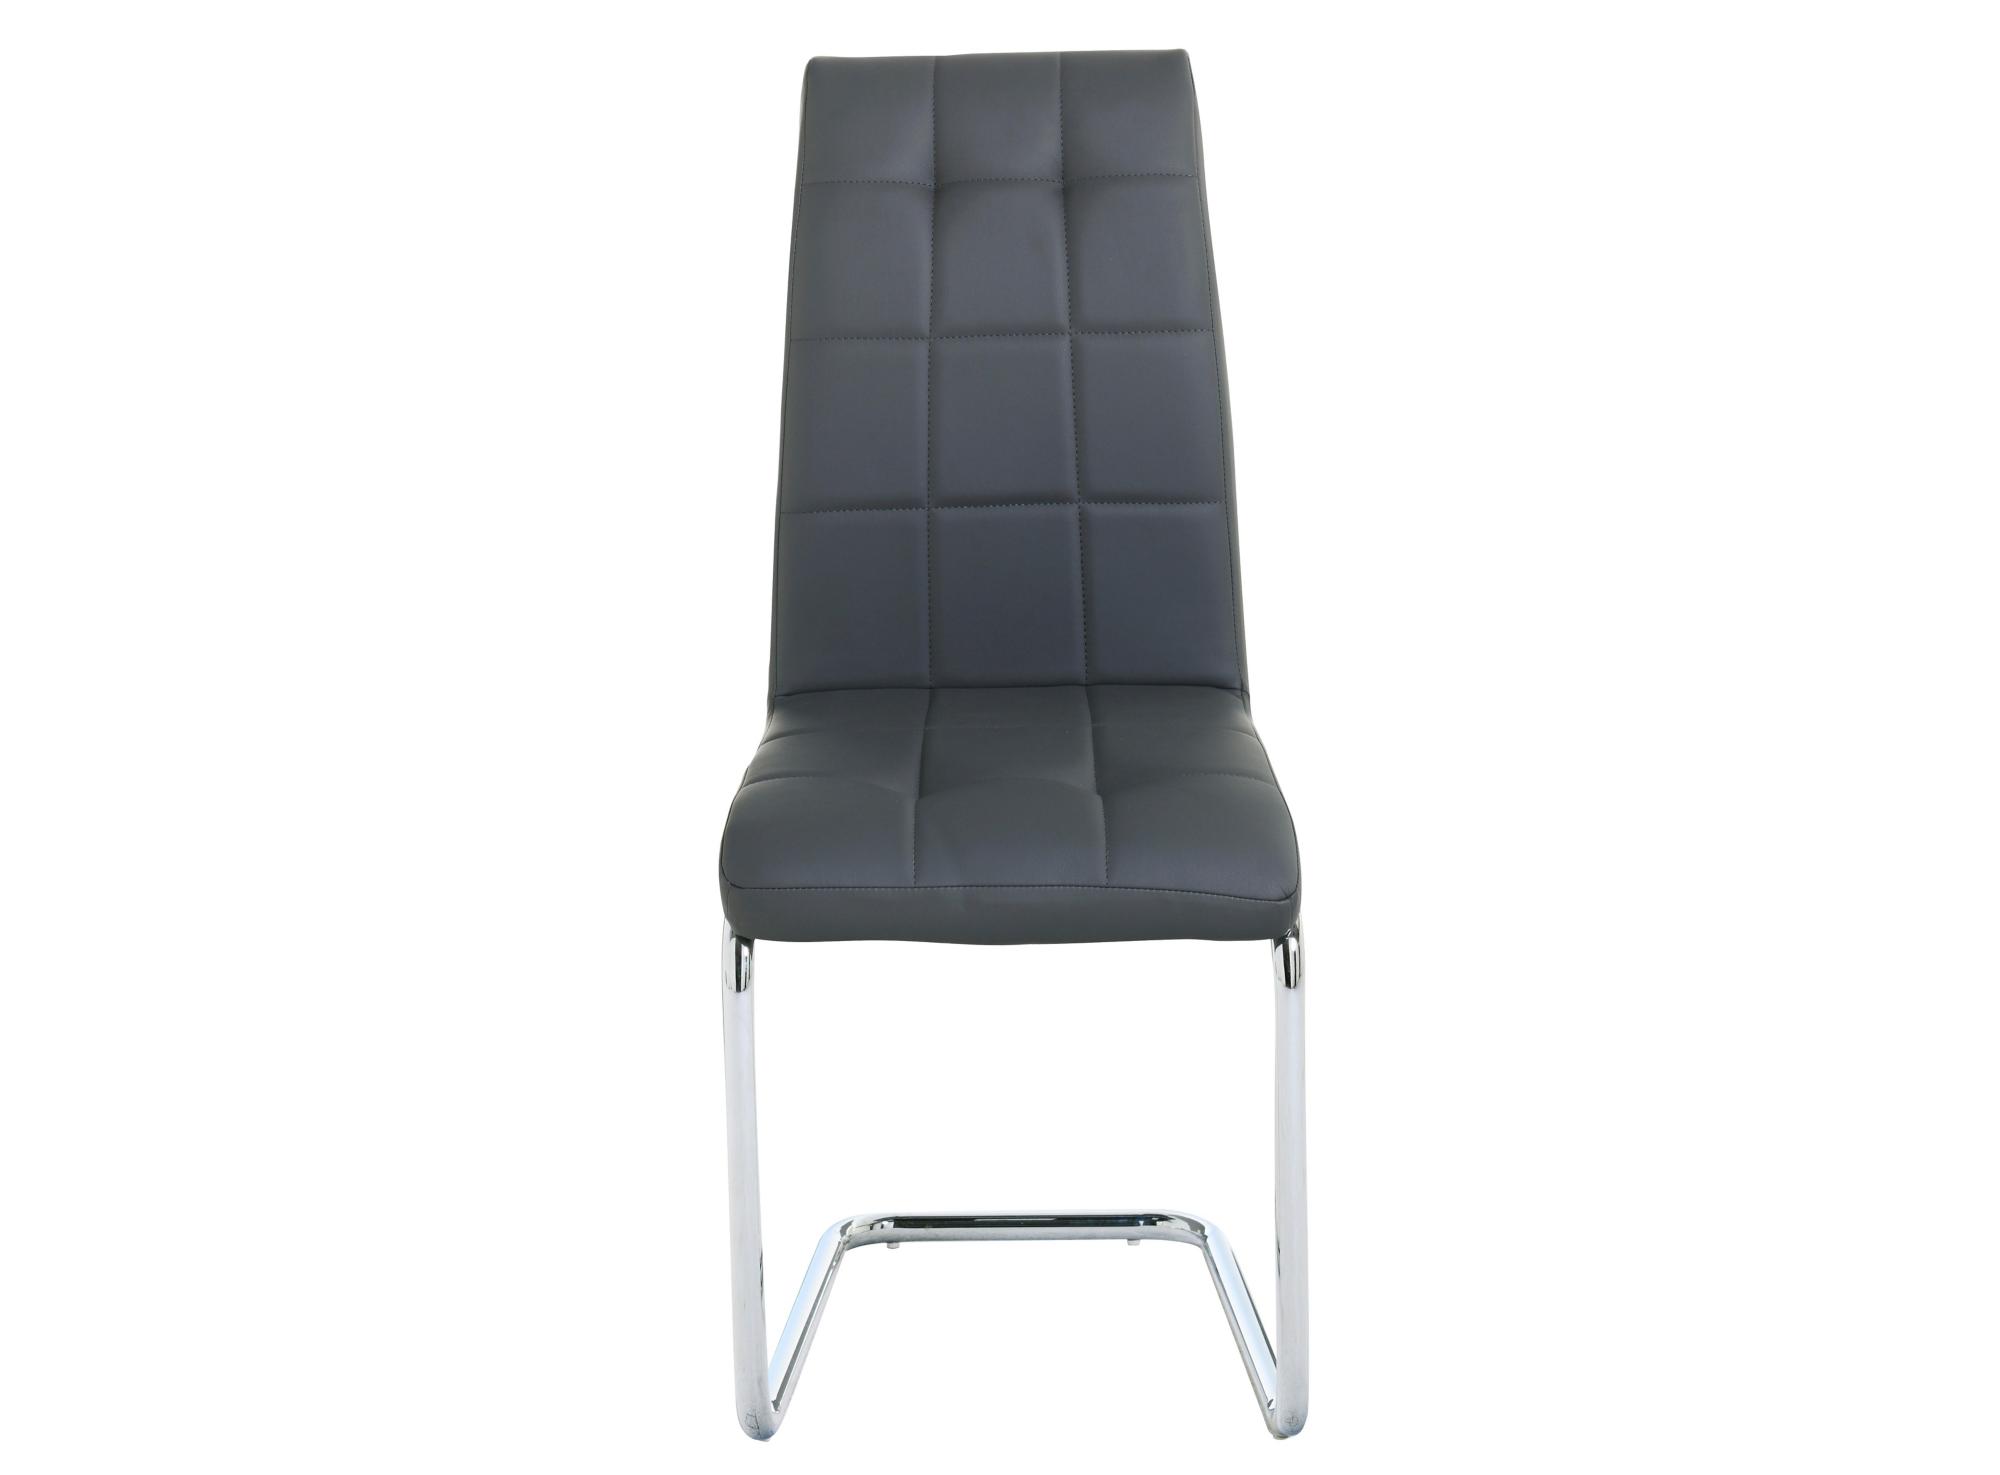 chaise design pas cher. Black Bedroom Furniture Sets. Home Design Ideas